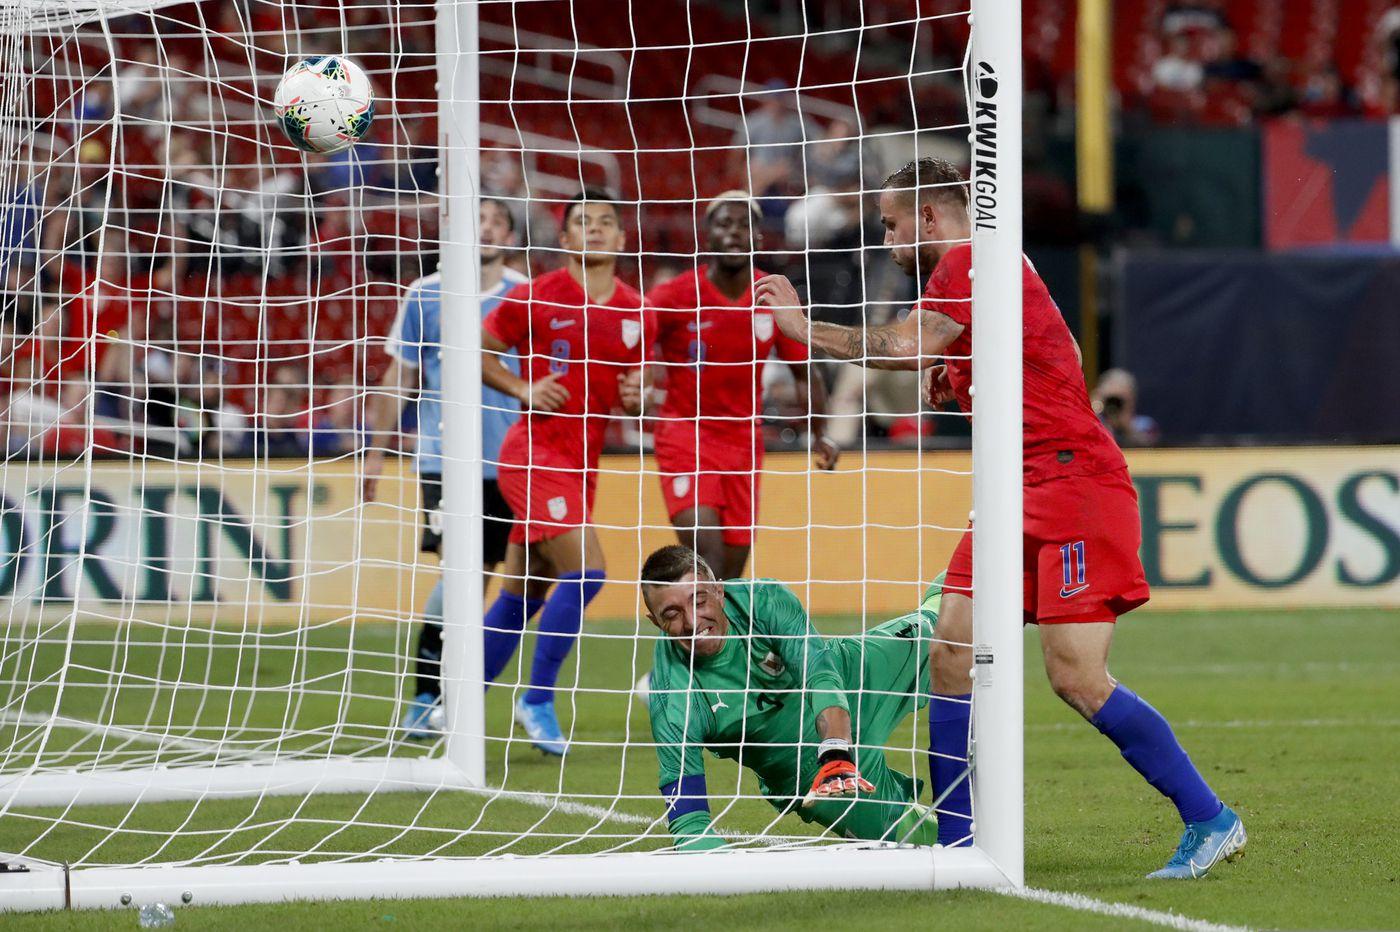 Jordan Morris' late goal gives U.S. men's soccer team 1-1 draw vs. Uruguay